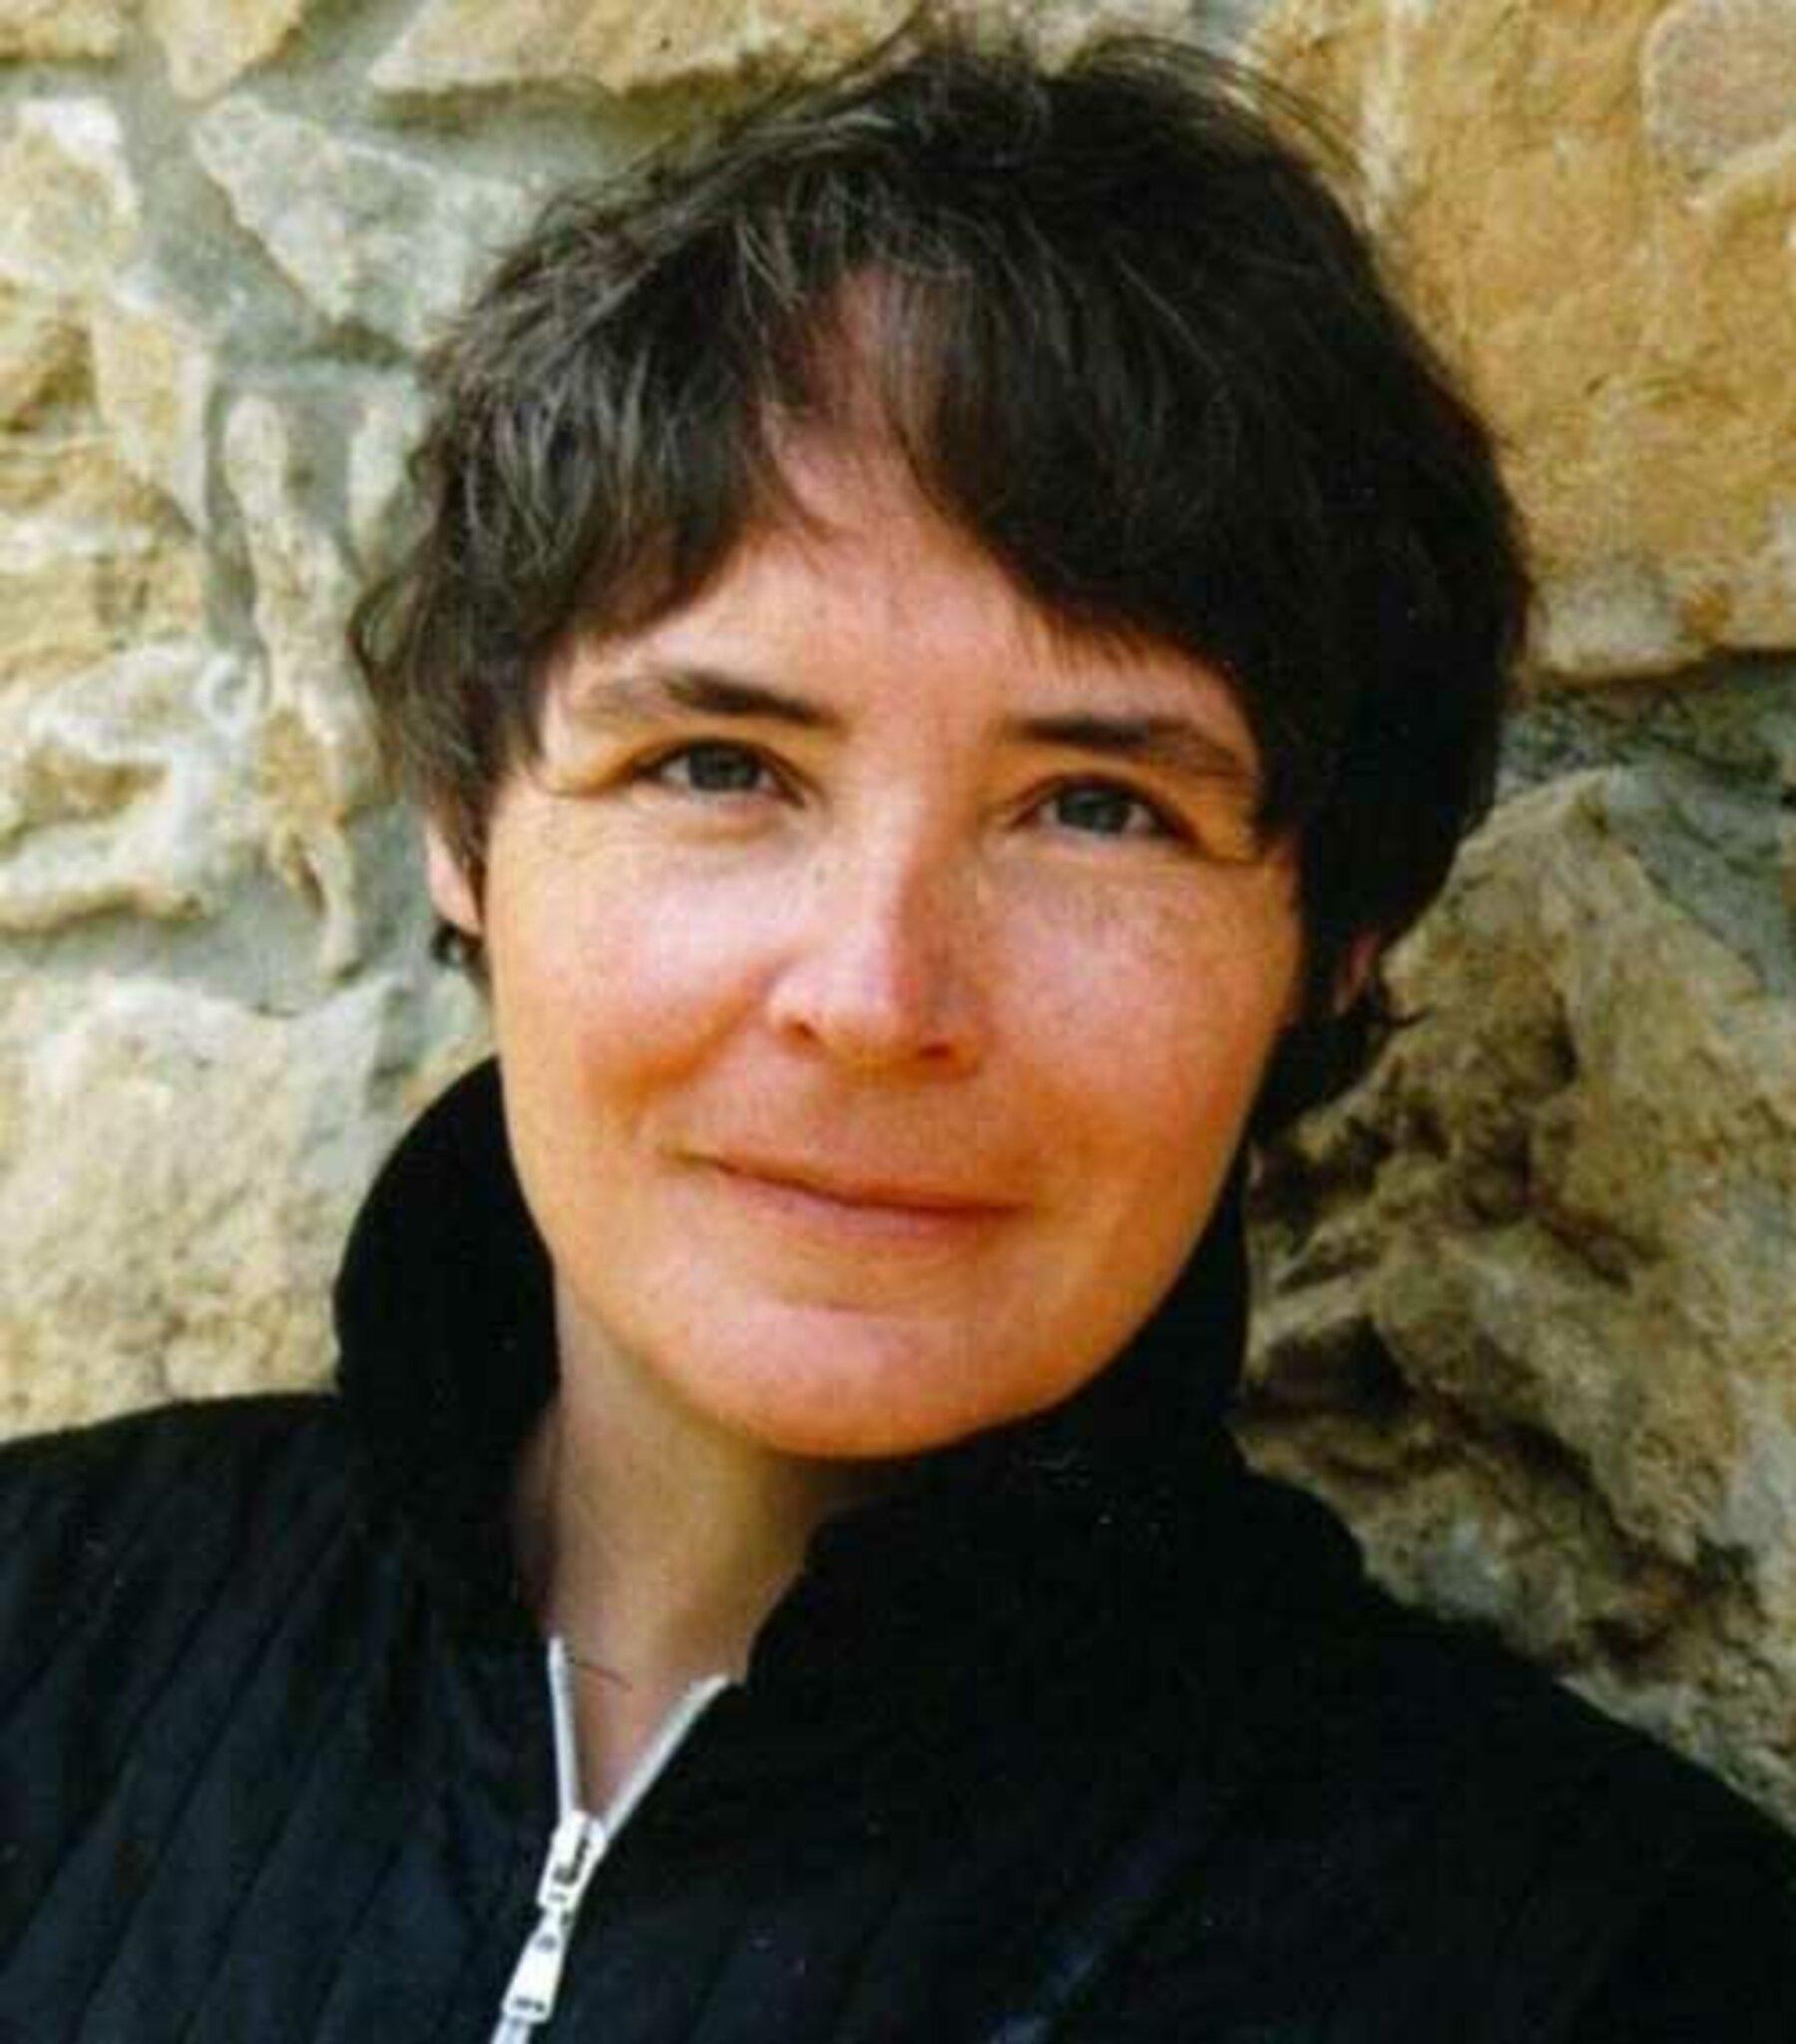 Simone Frieling